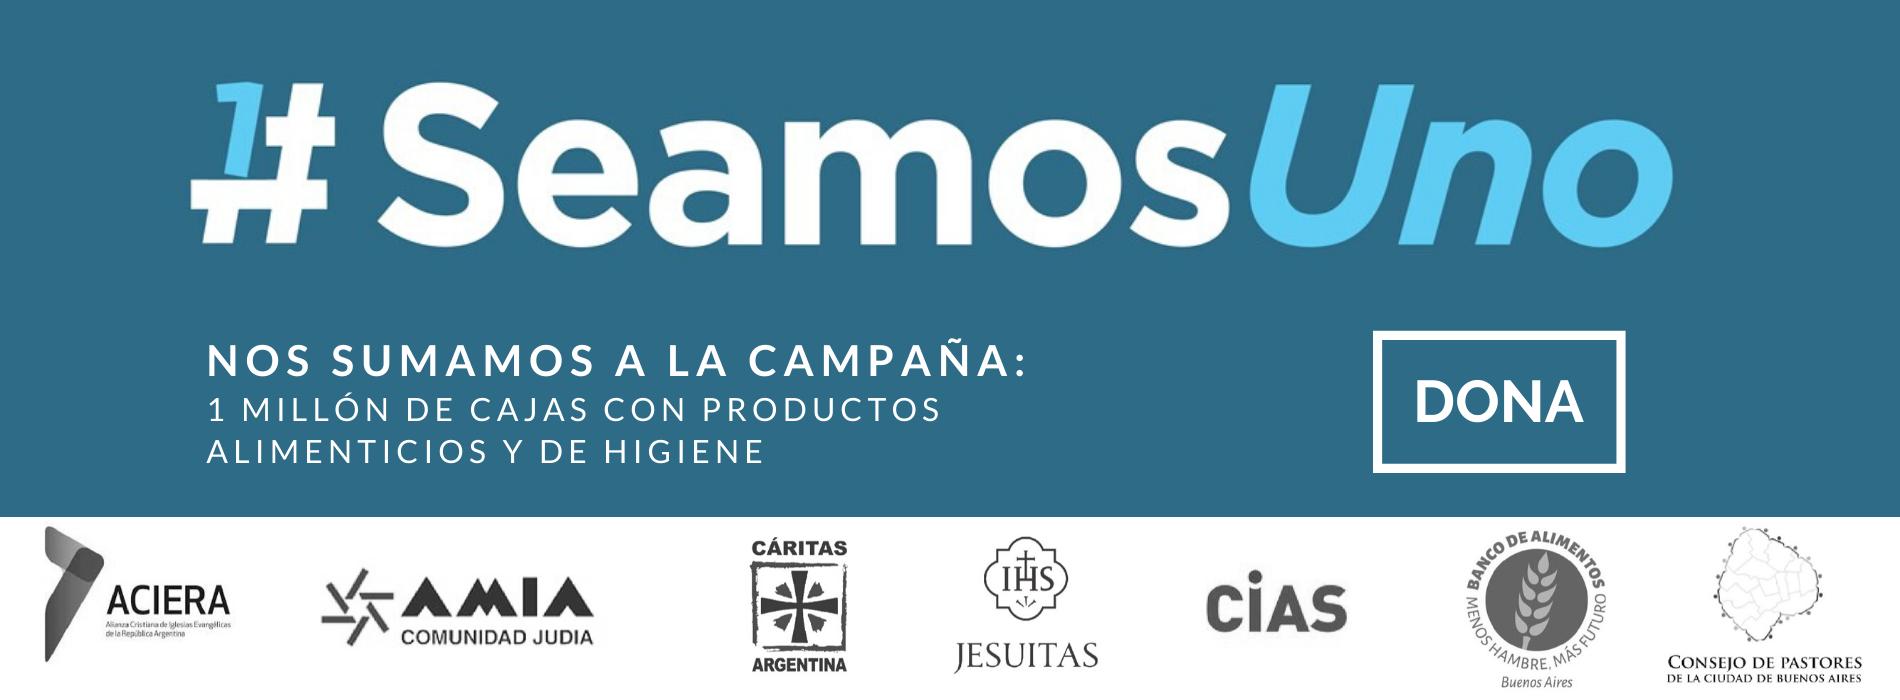 SeamosUno-banner-